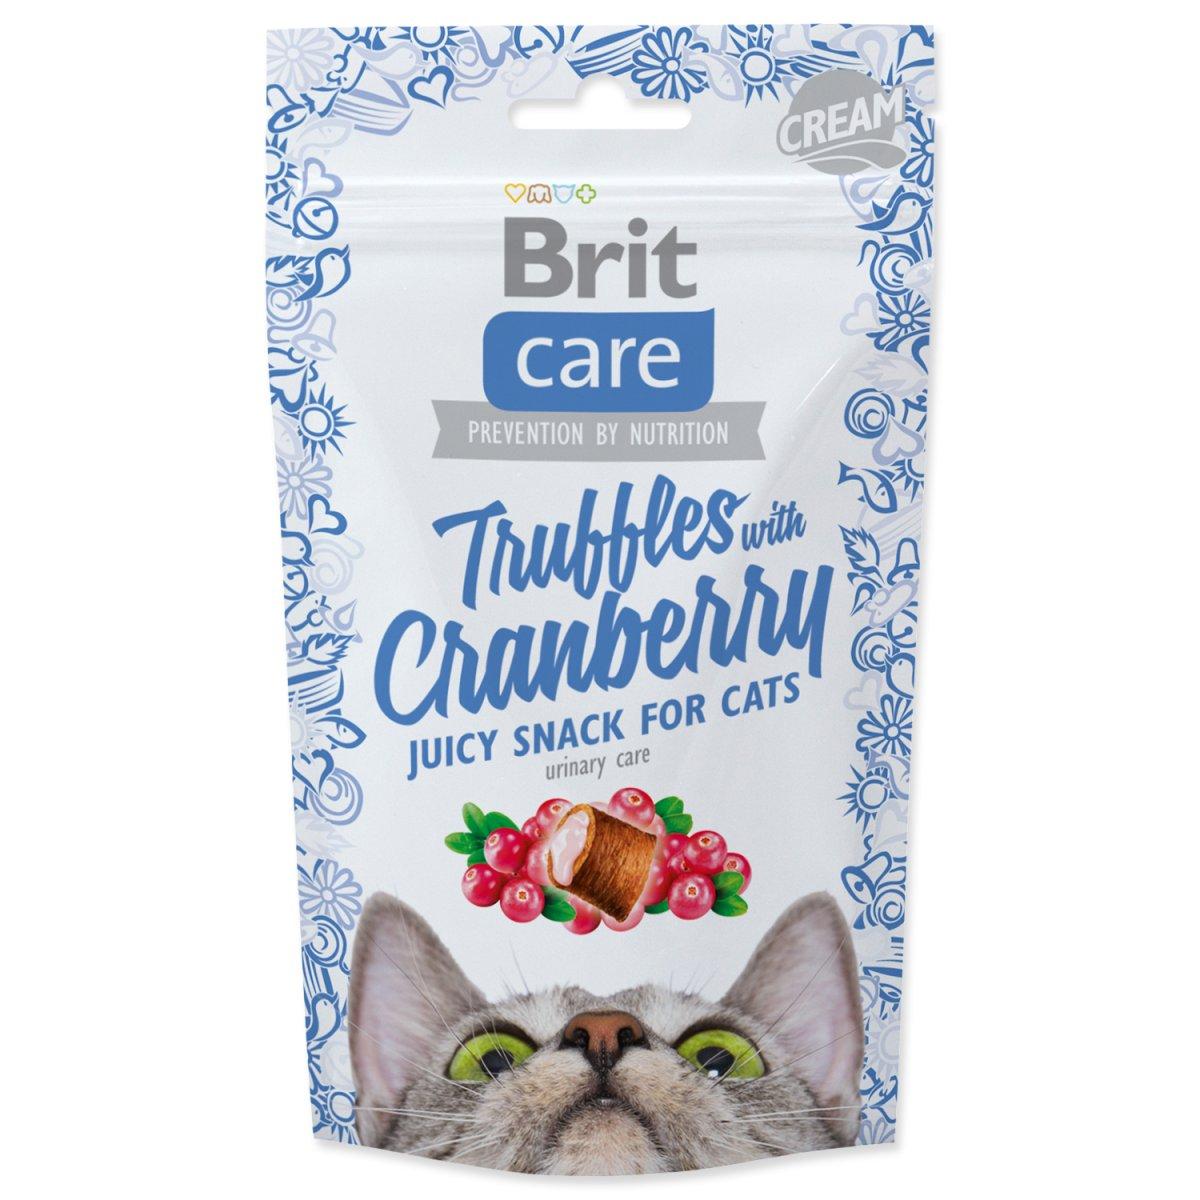 BRIT Care Cat Snack Truffles Cranberry (50g)